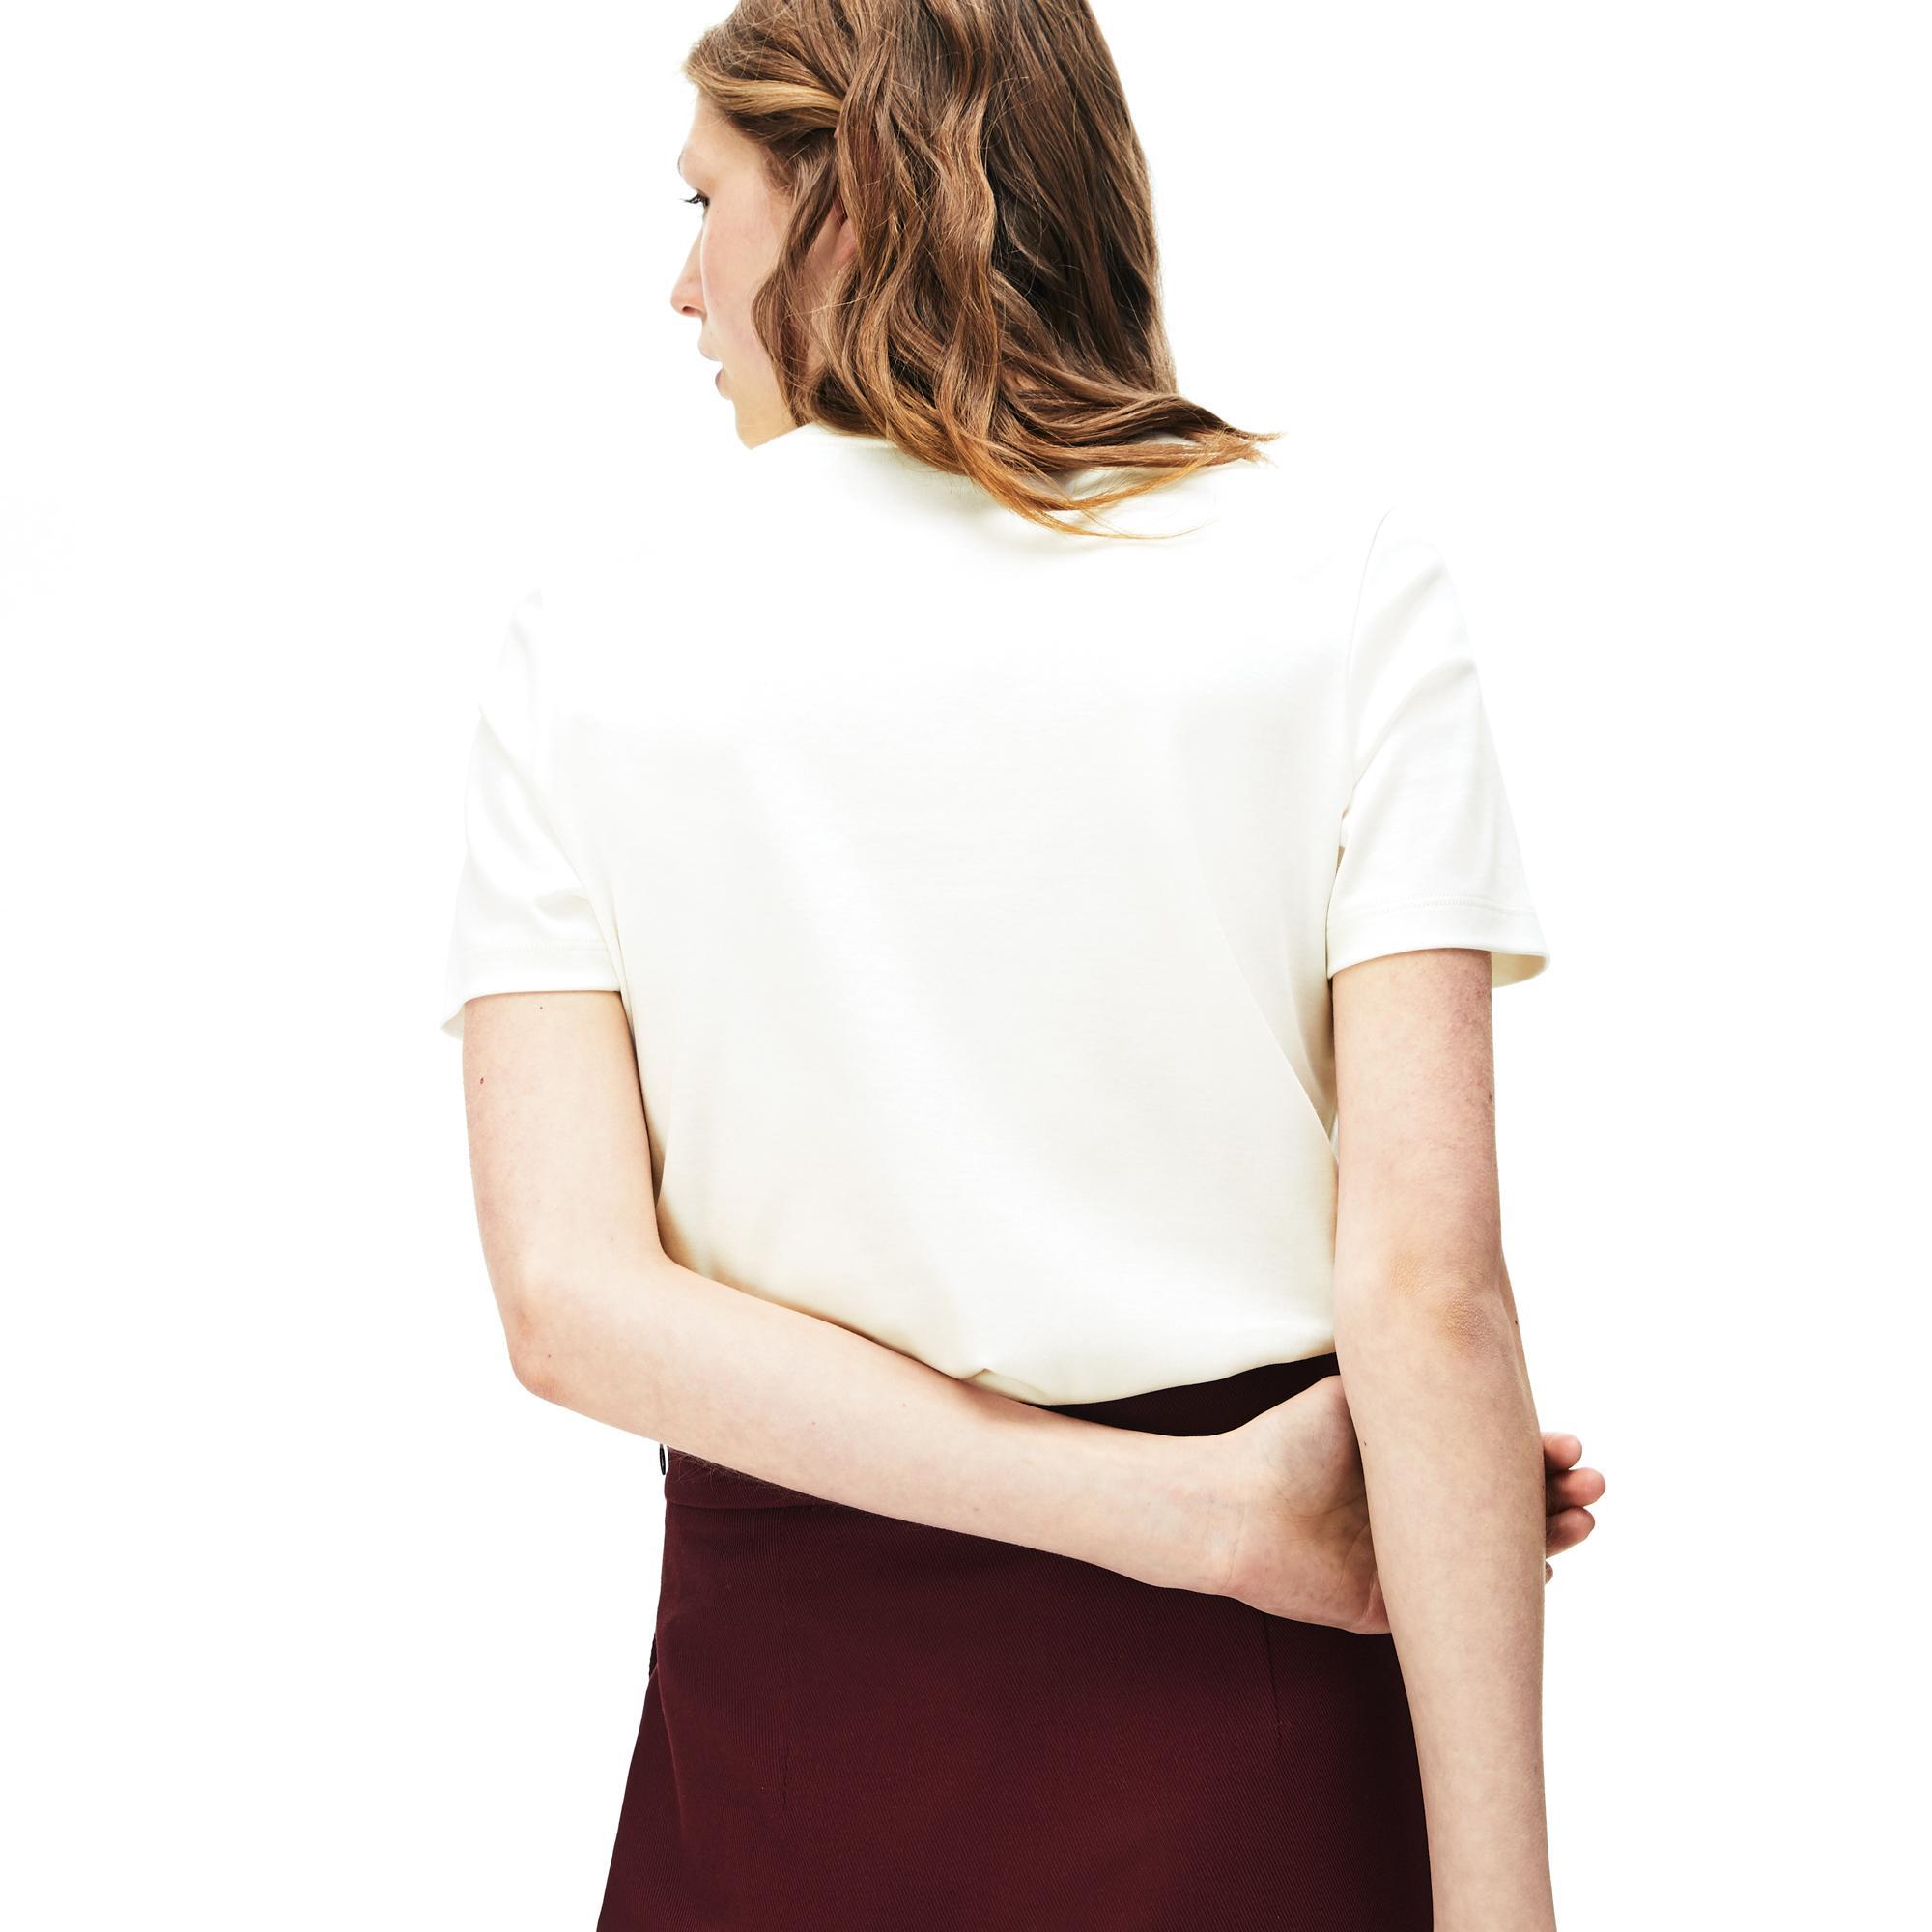 Lacoste Women's Crew Neck Check Lacoste Badge Lightweight Cotton T-Shirt